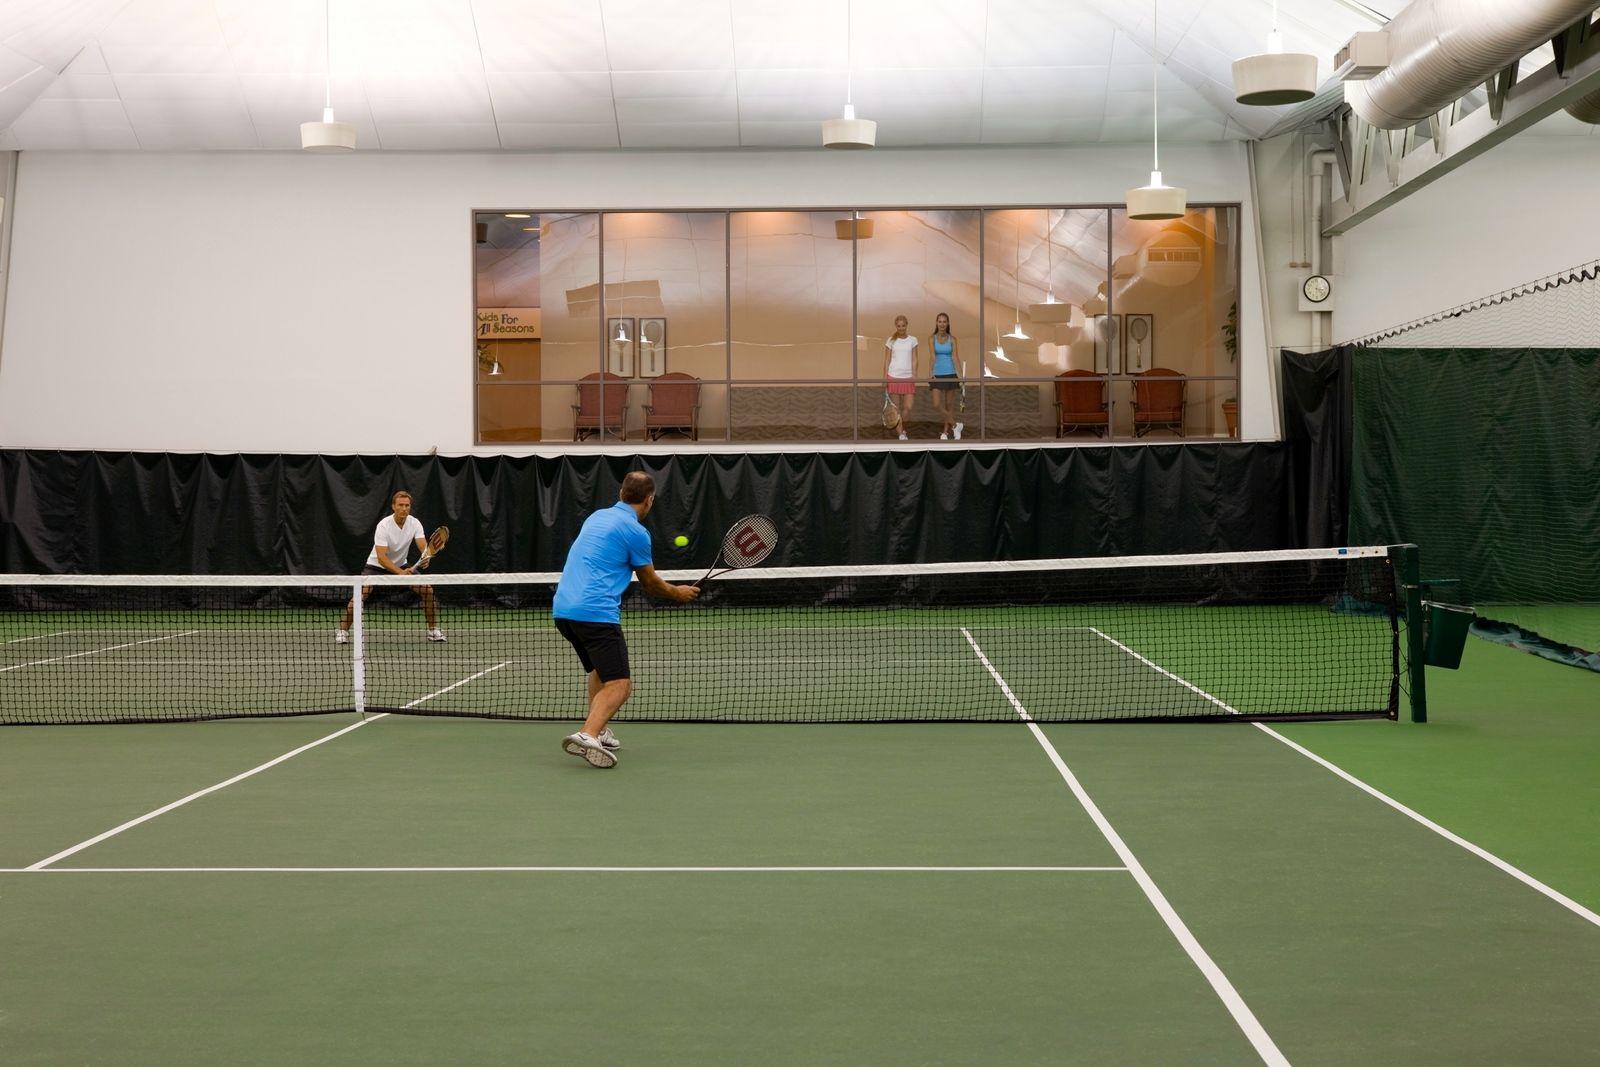 tennis-tourist-courtesy-dallas-four-seasons-tennis-courts-indoor ...